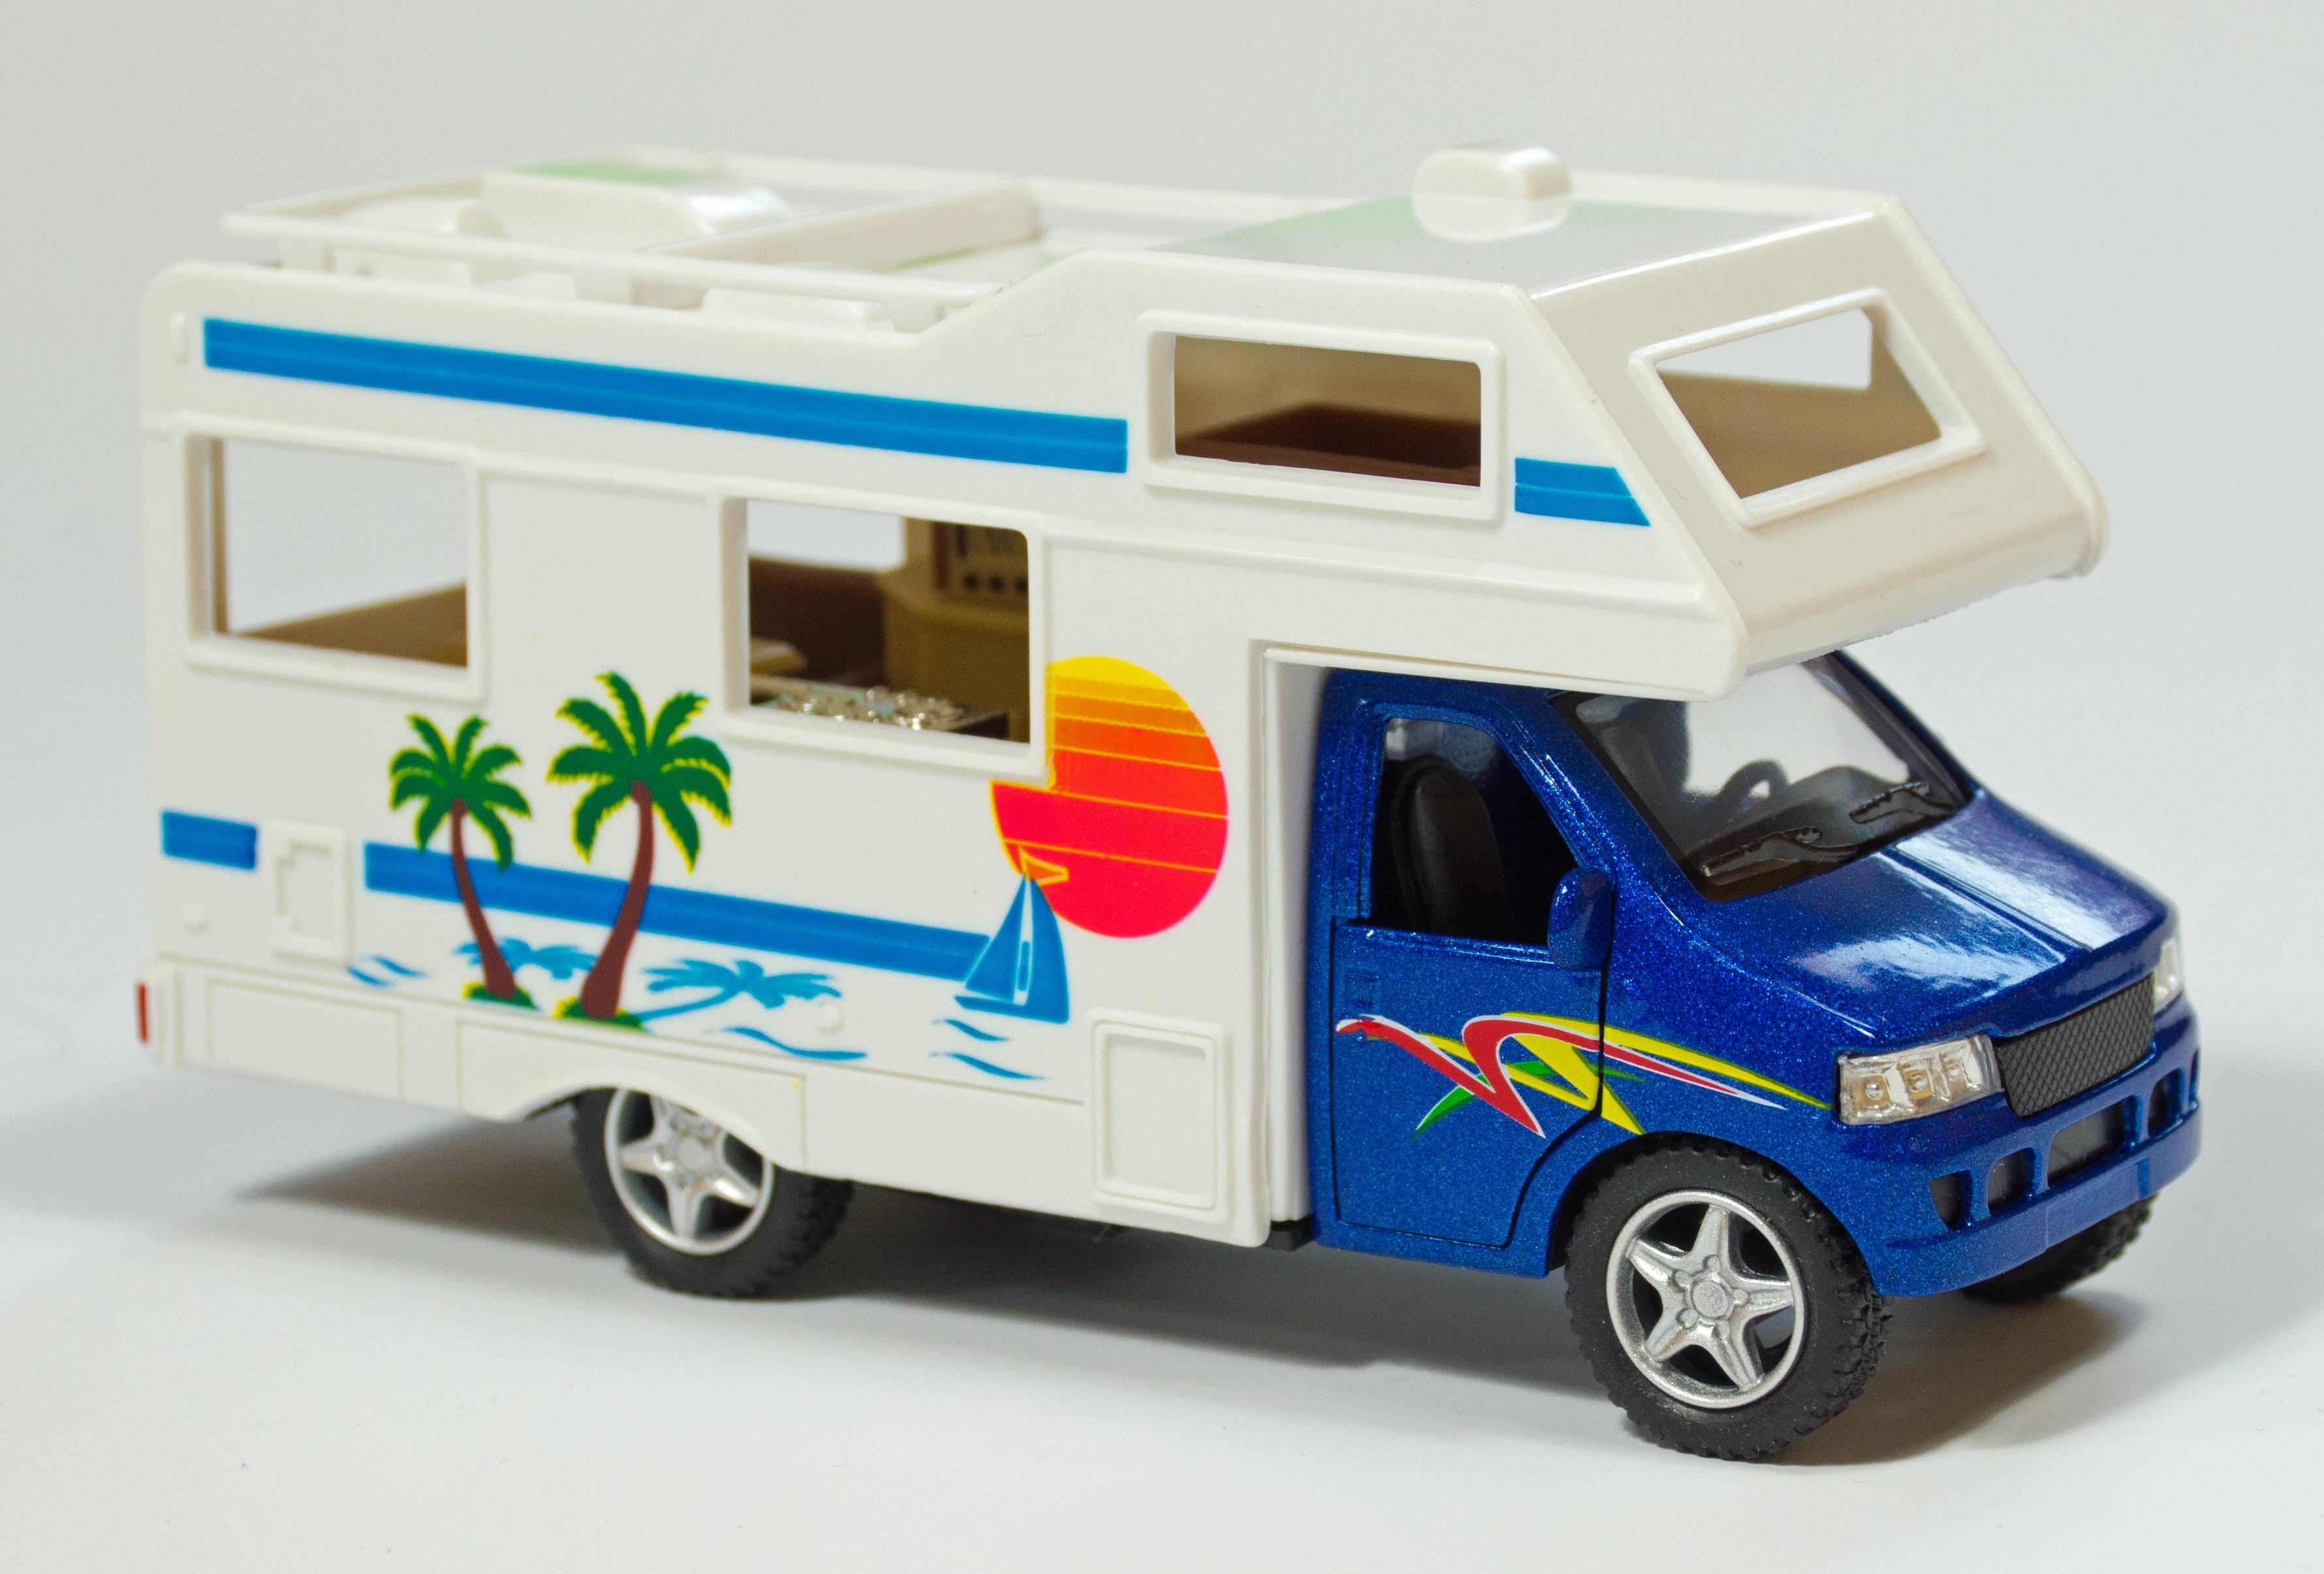 HM studio obytné auto barva kabiny: modrá